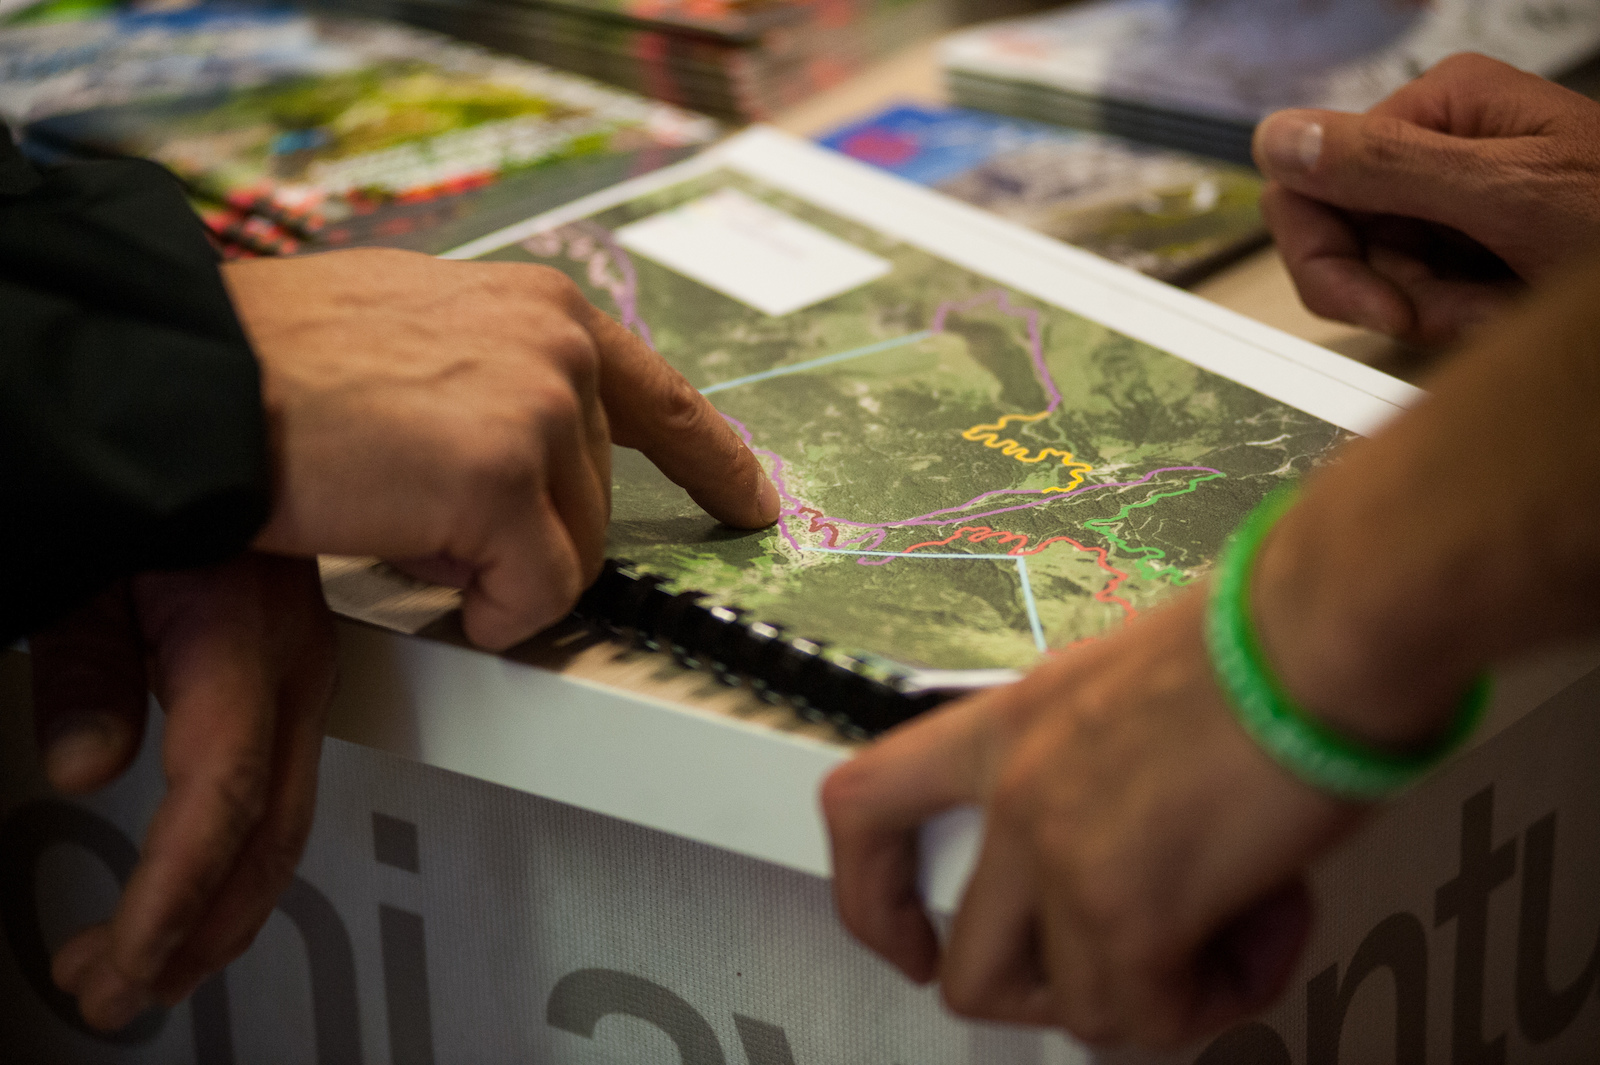 Superenduro 2017 Round 2 - Canazei Day 1